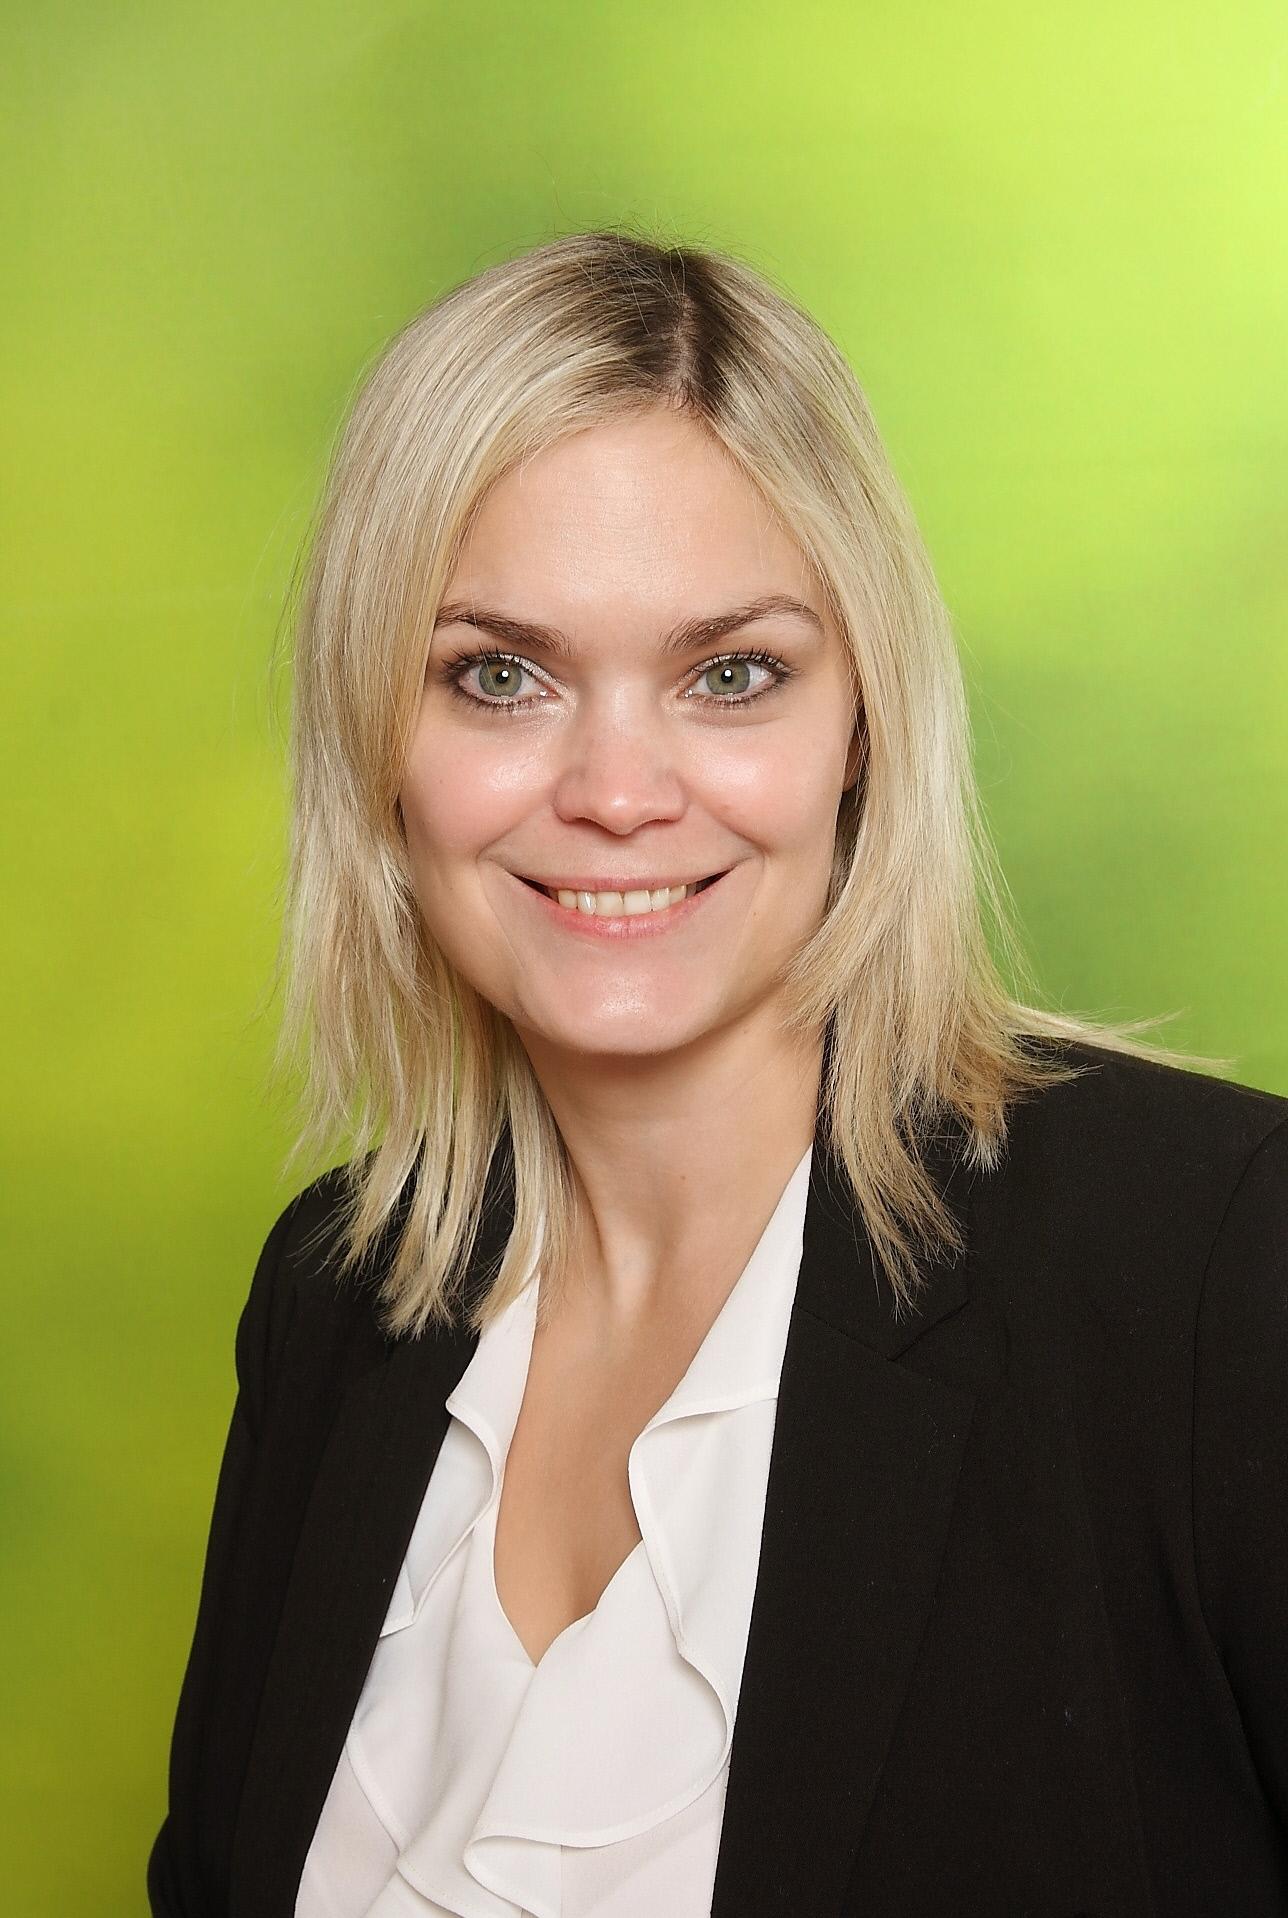 Melinda Kohlmayer